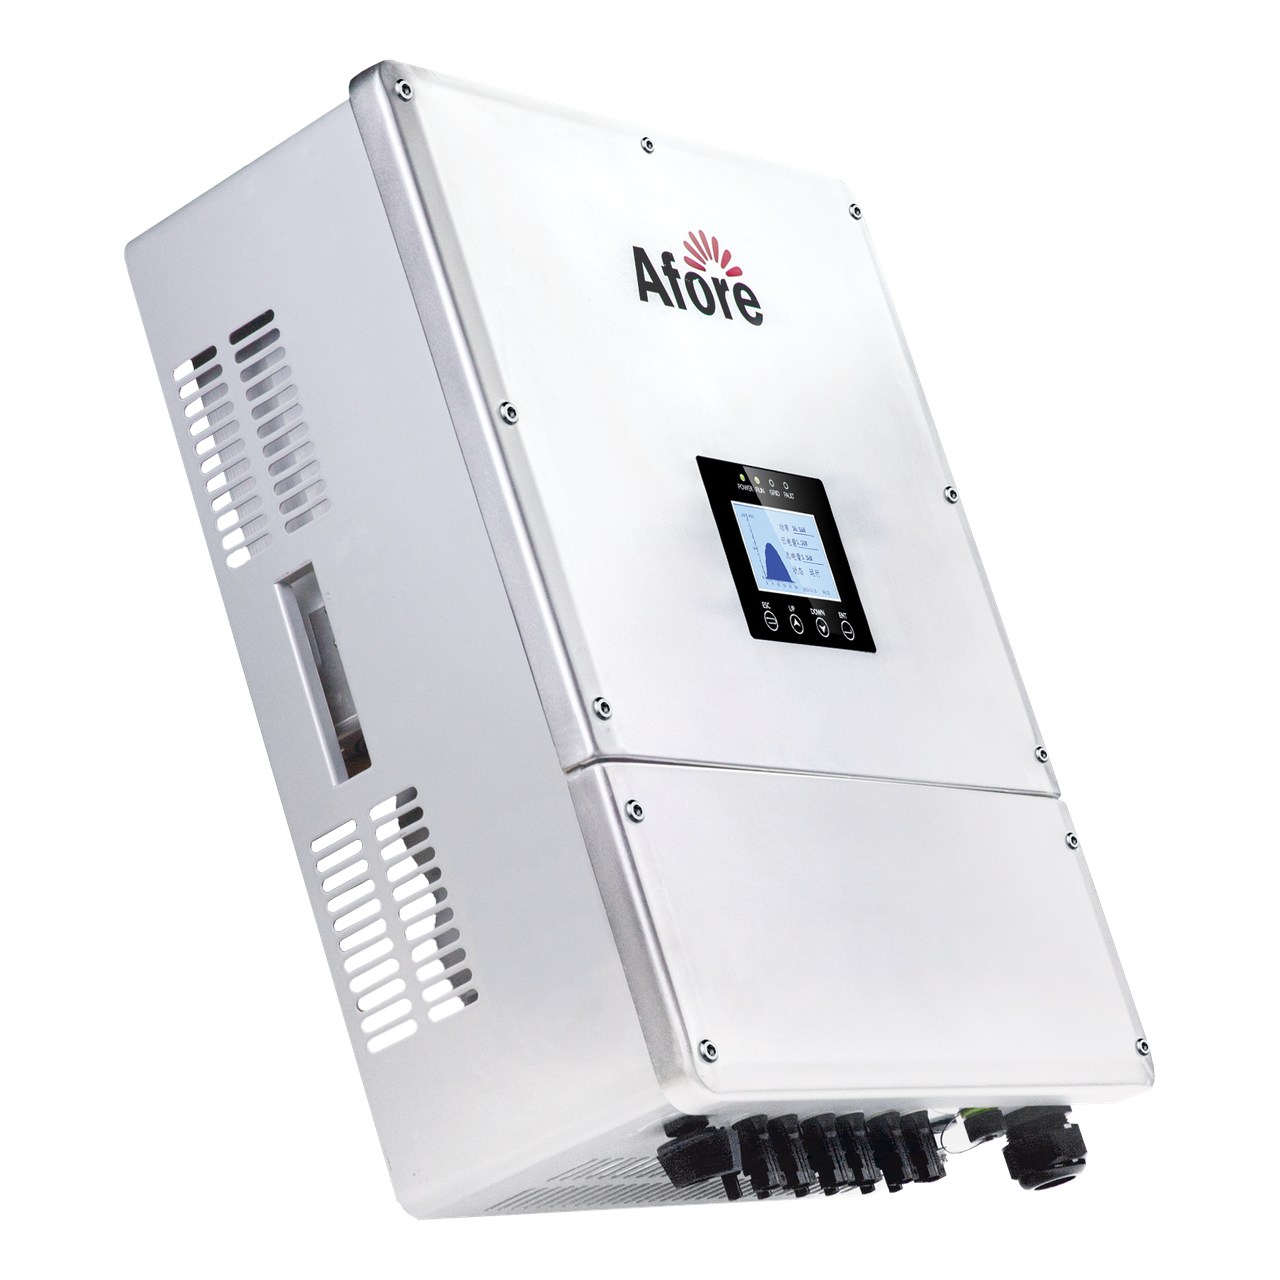 Инвертор сетевой AFORE BNT030KTL (3MPPT) + WIFI 30 кВт